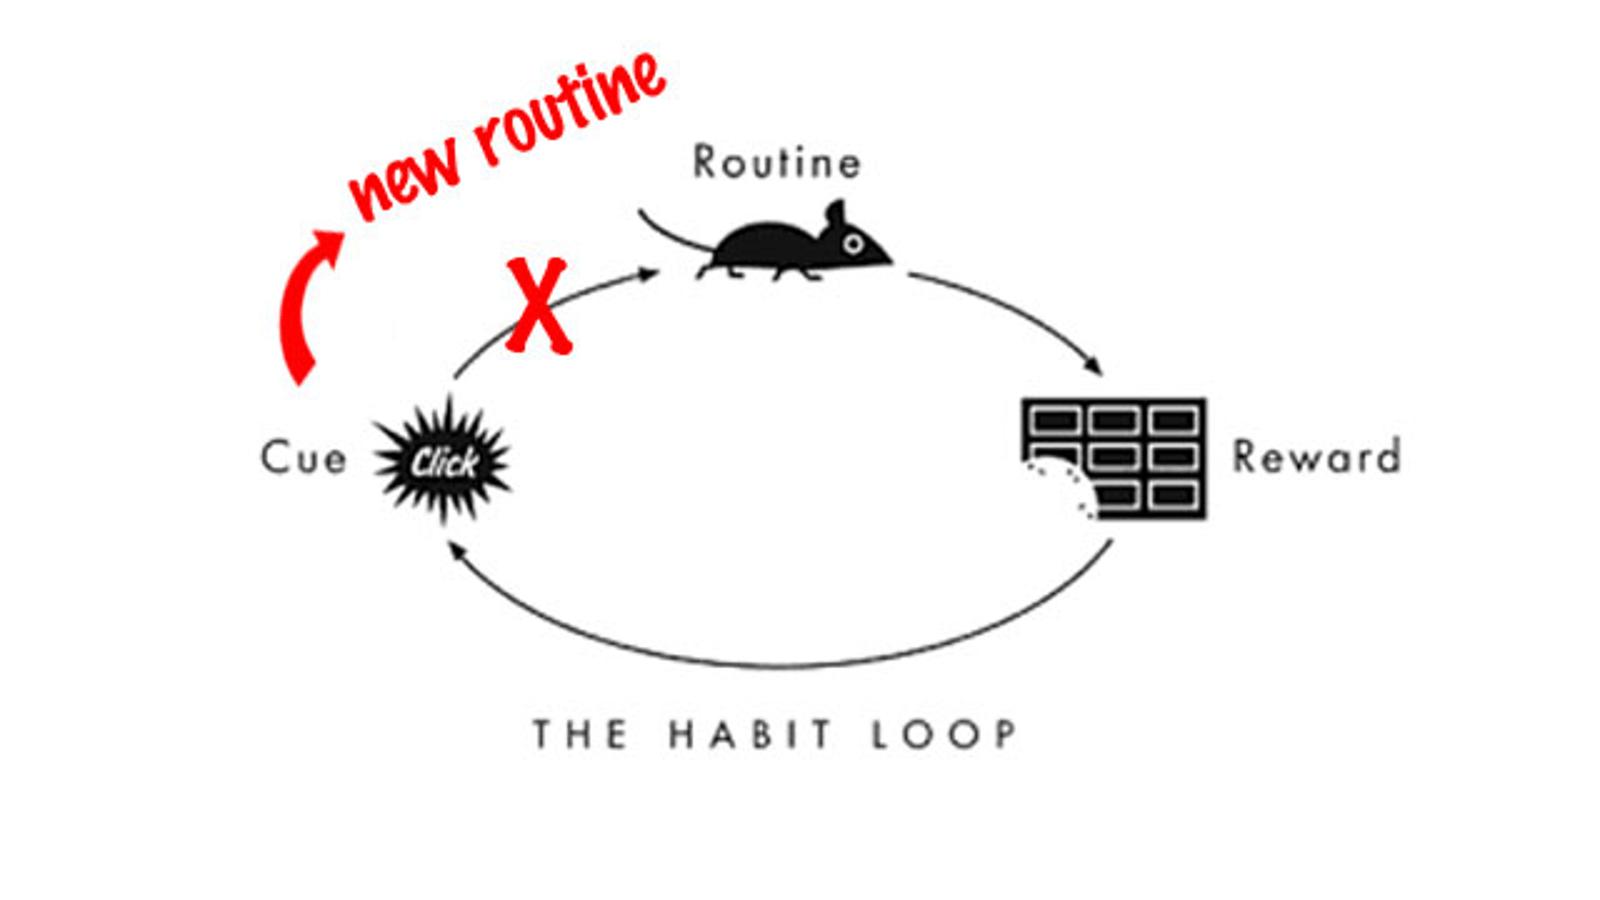 Break Bad Habits By Developing An If Then Plan